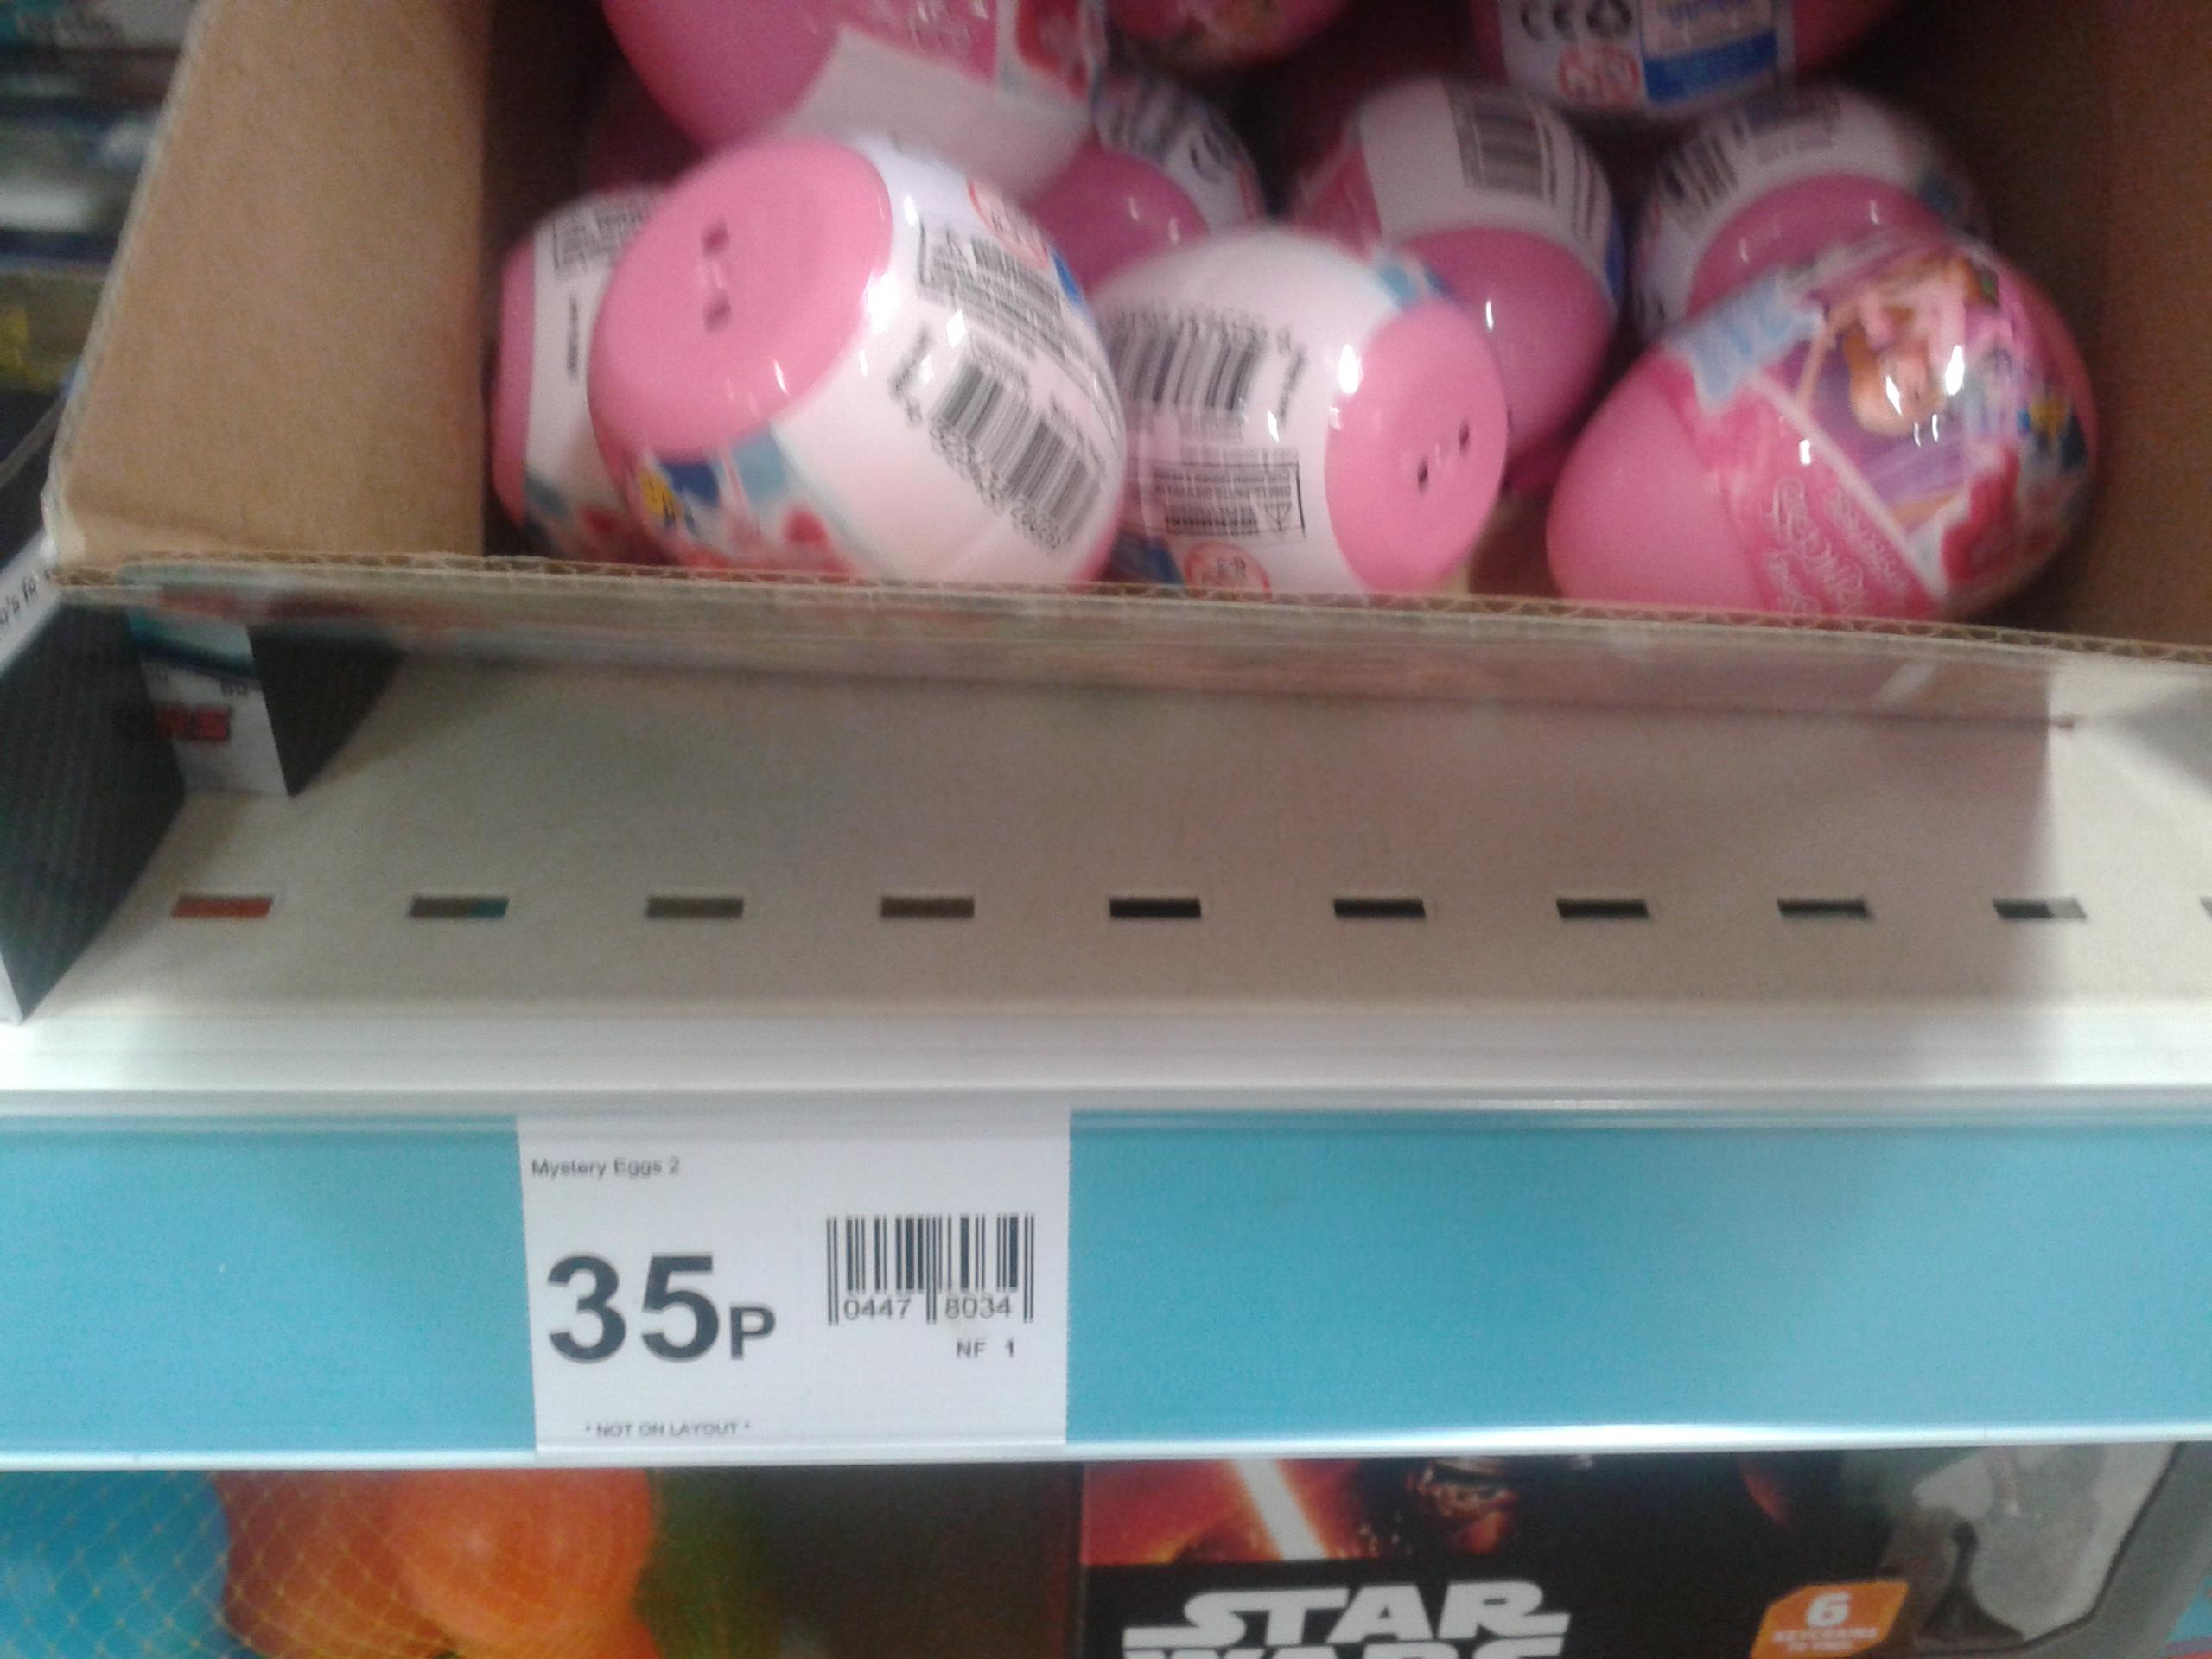 Disney Princess Mystery Eggs 35p @ Wilko Instore